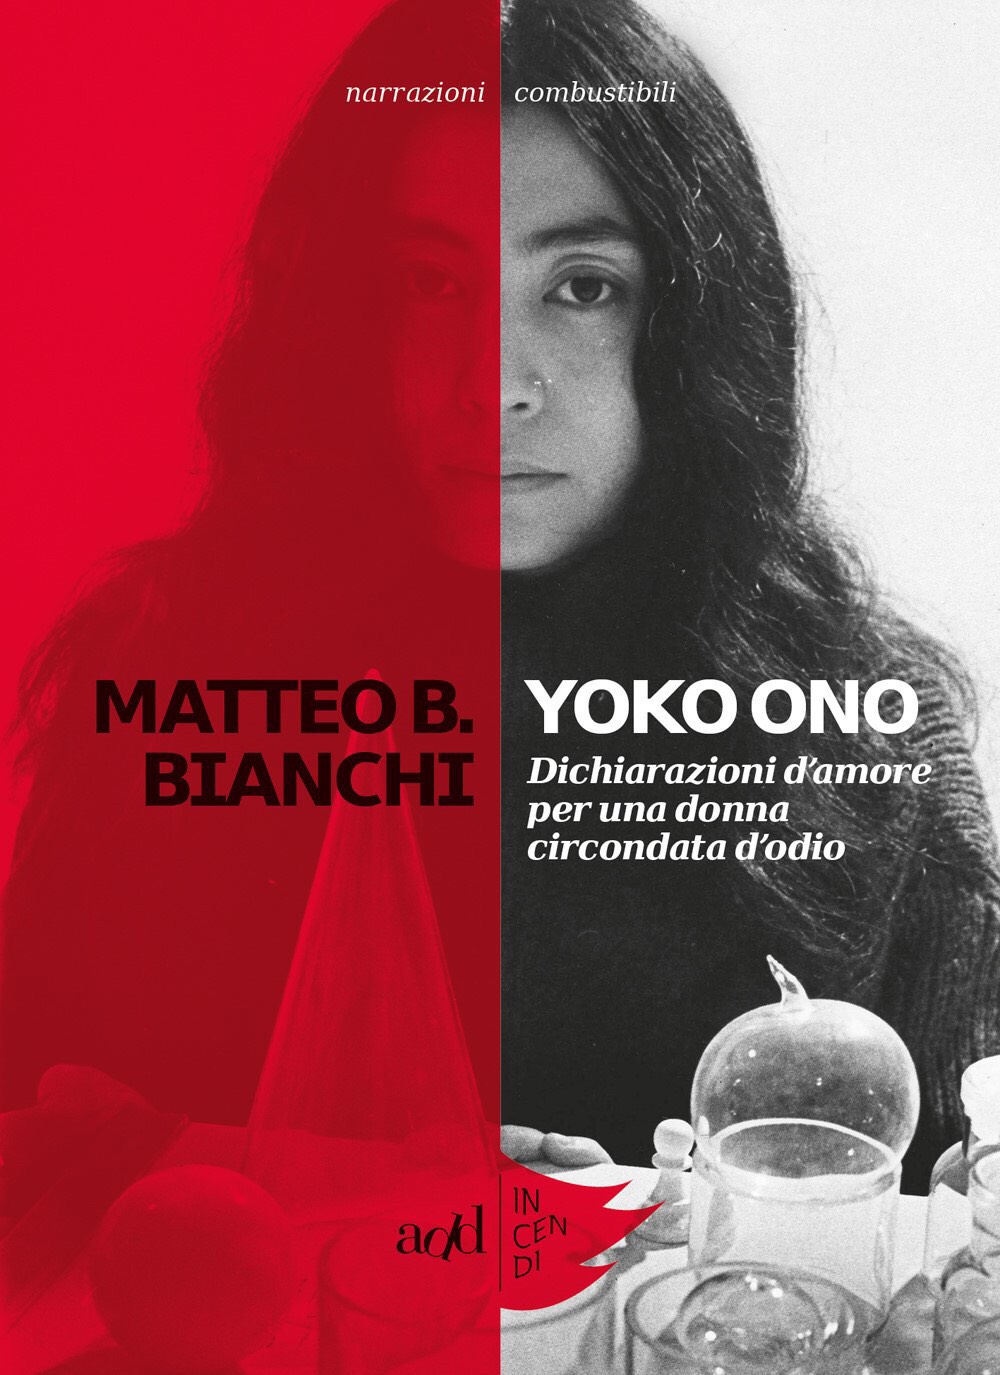 Yoko Ono – Matteo B. Bianchi